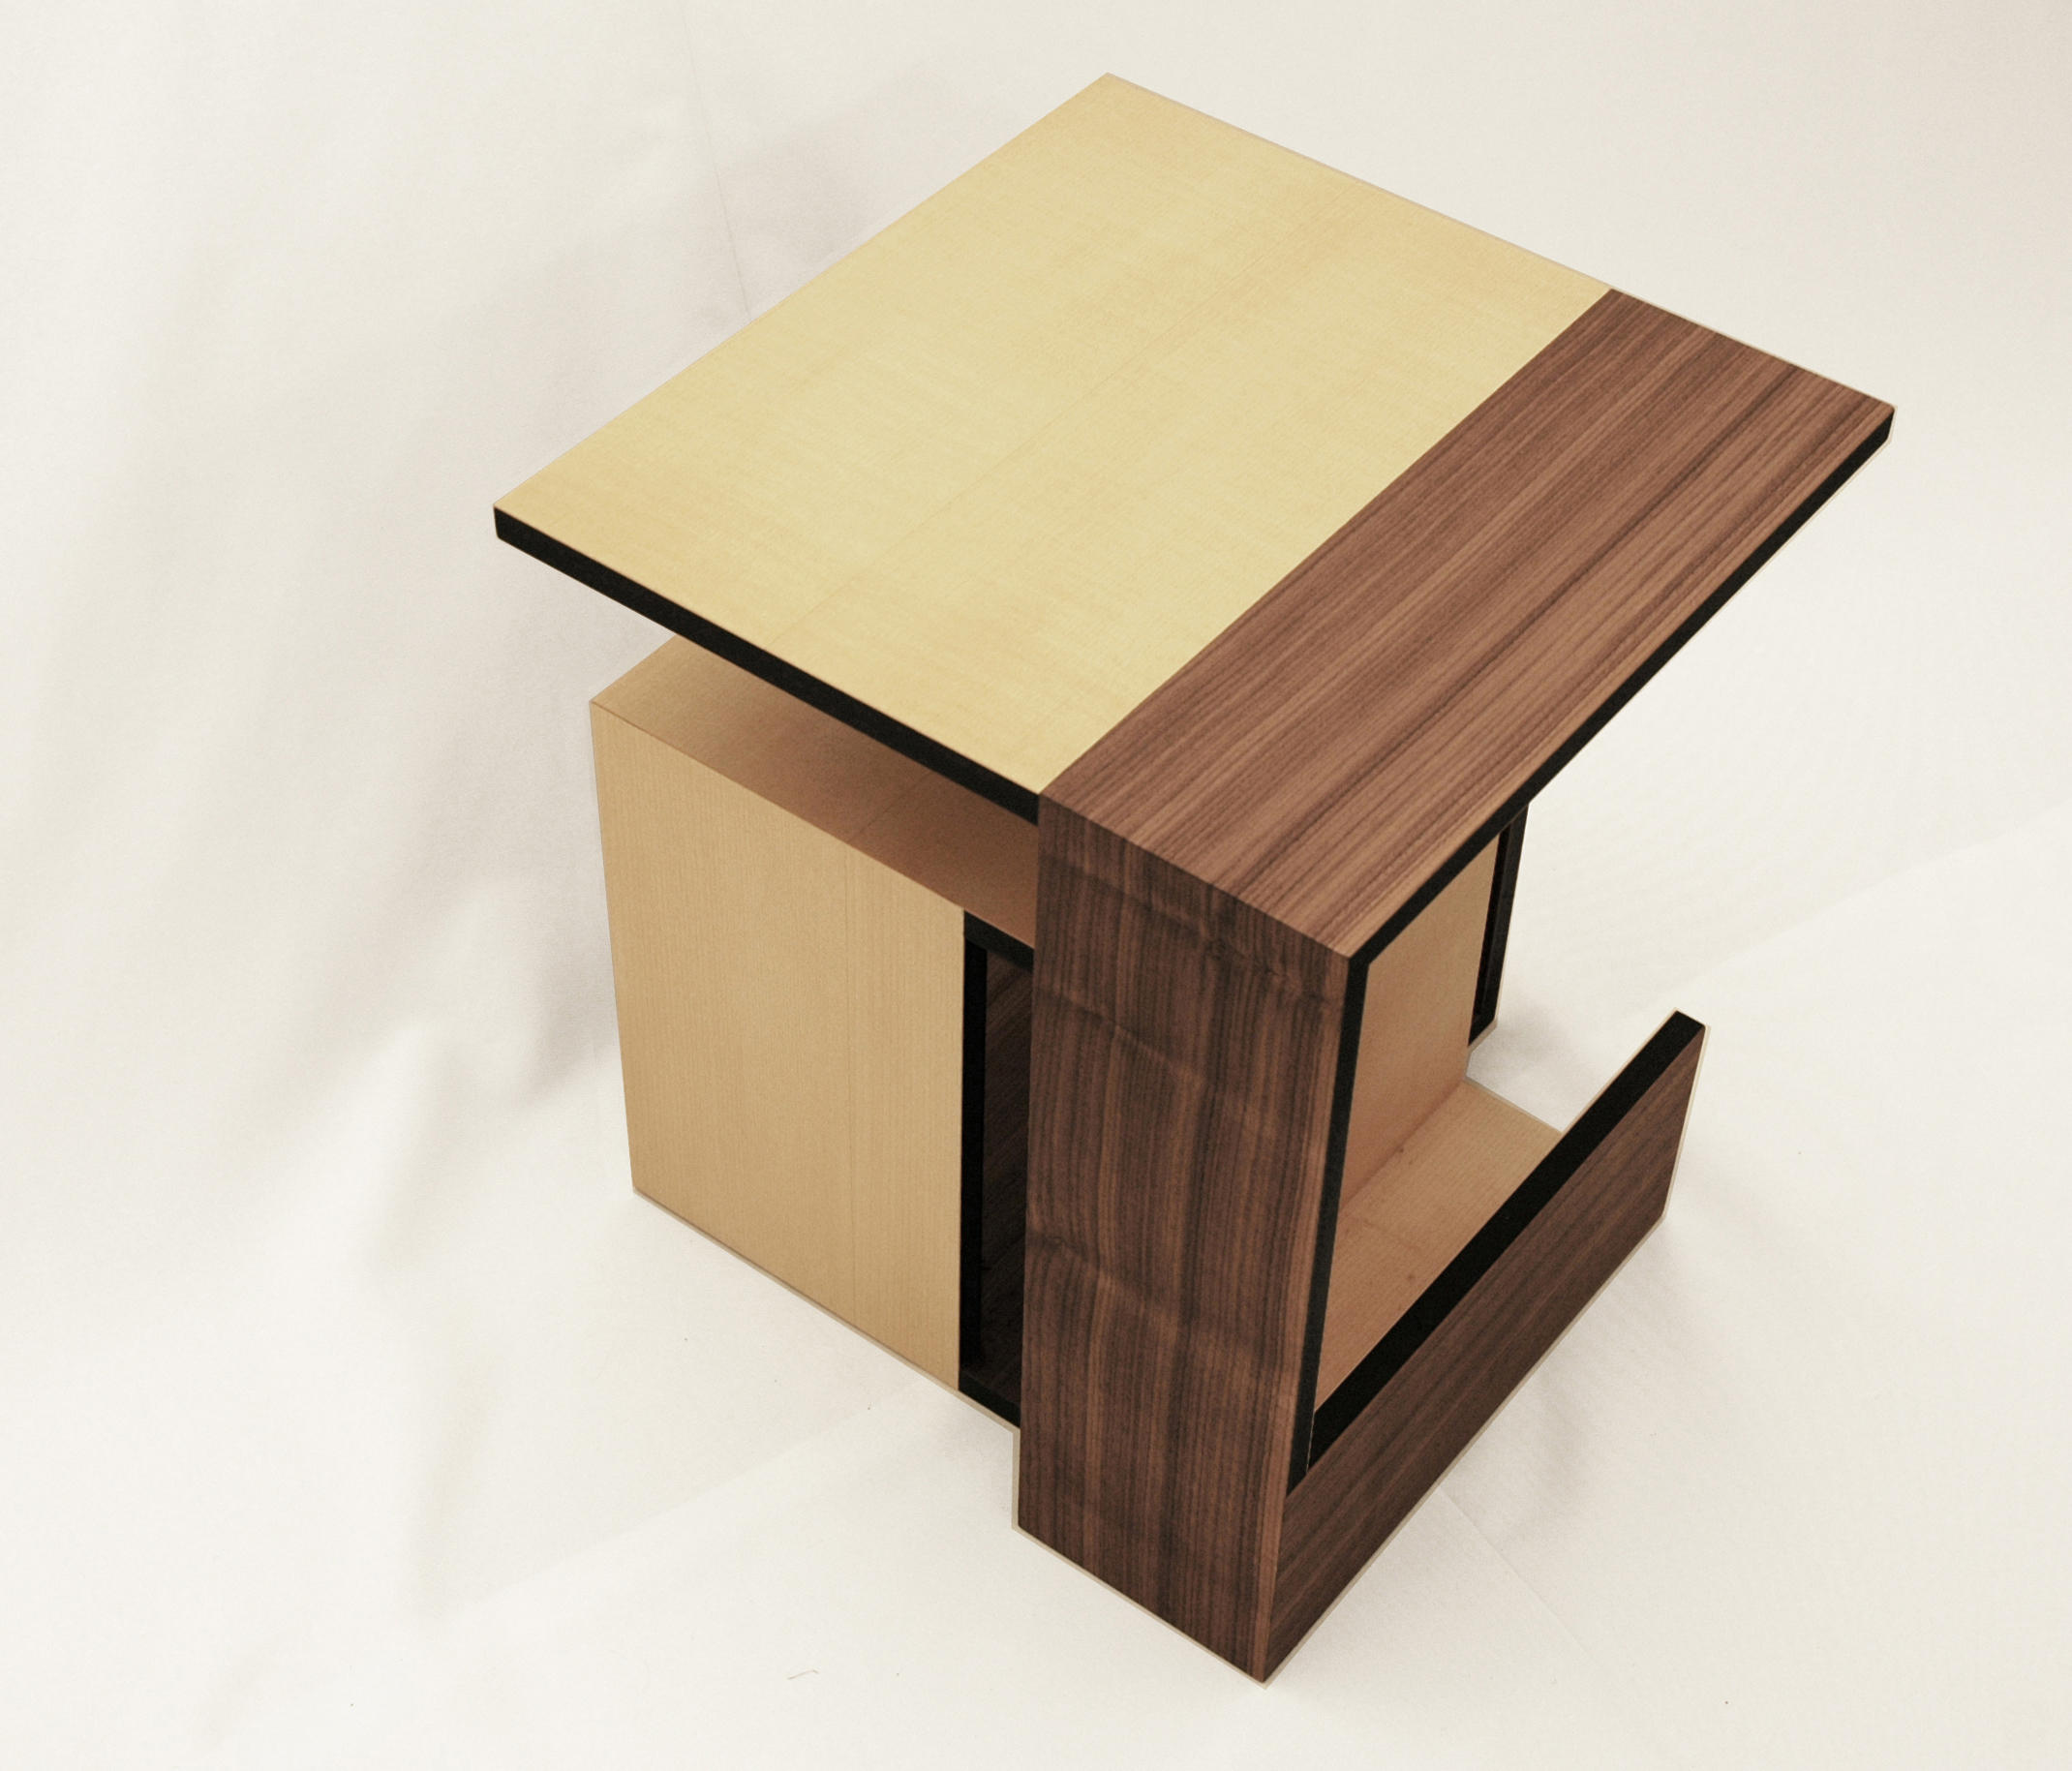 moebius cube by xbritt moebel side tables